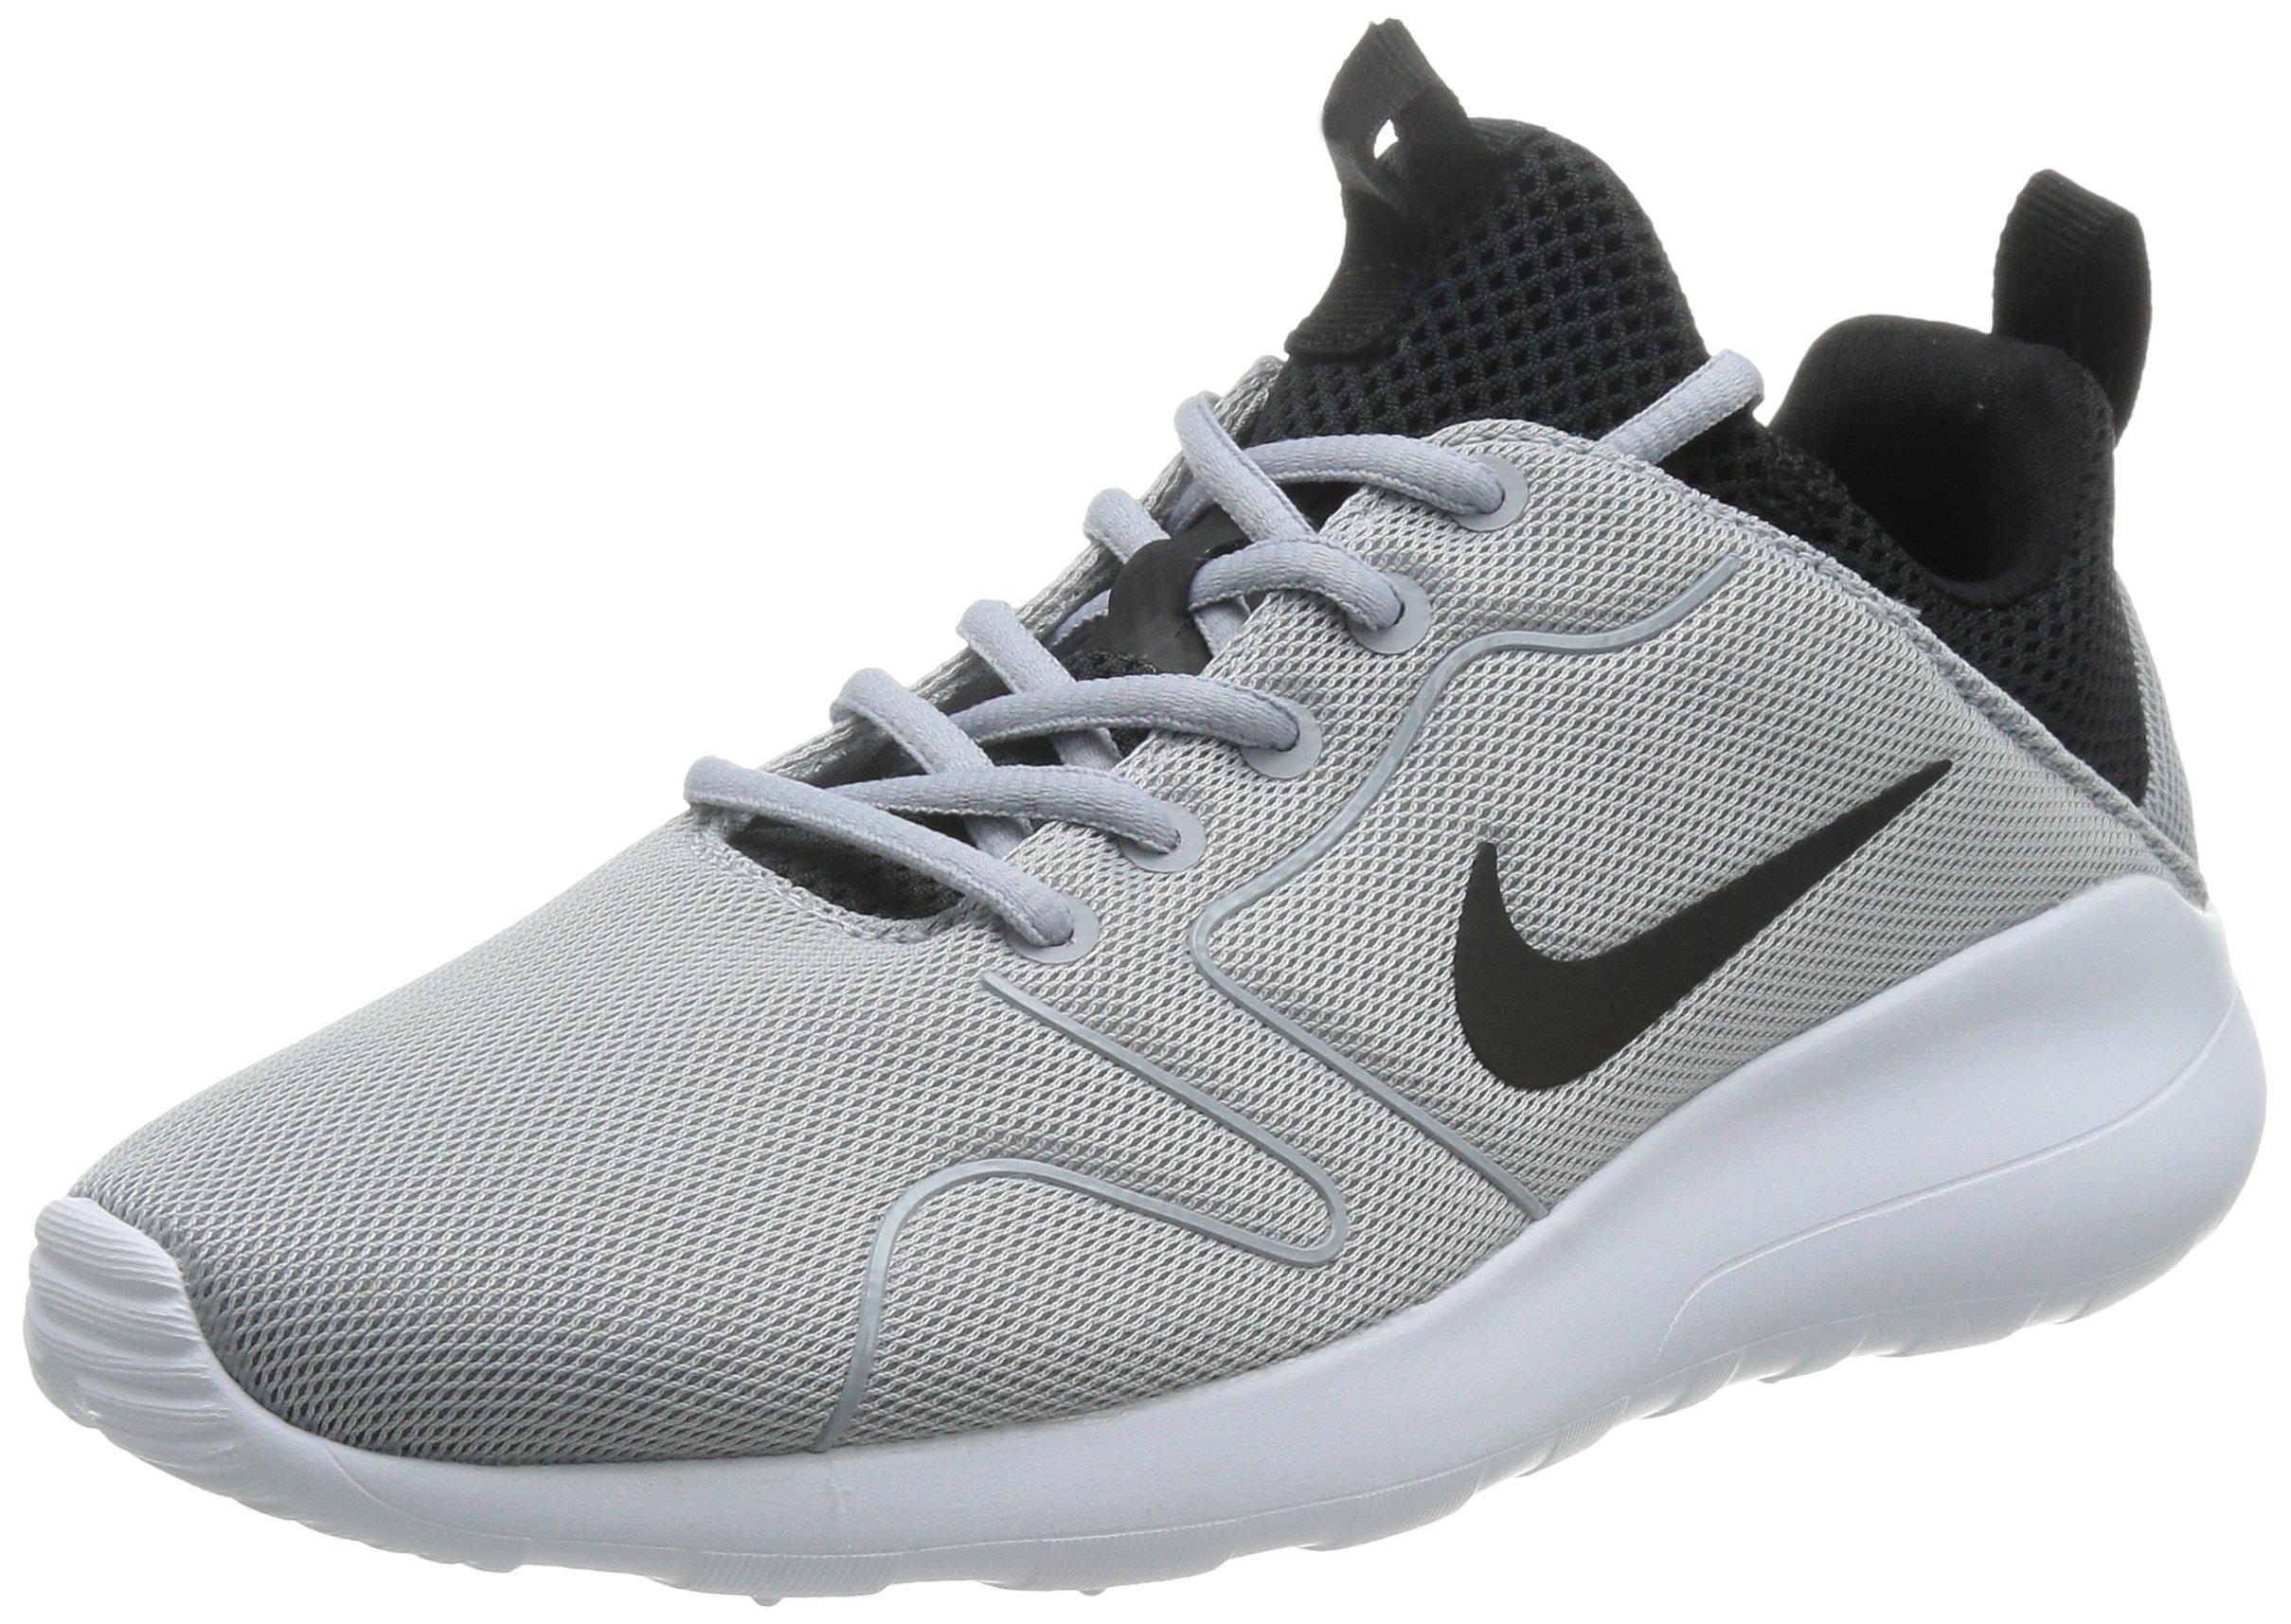 online store 746e3 8fb8a Galleon - Nike Men s Kaishi 2.0 Wolf Grey Black White Running Shoe - 10  D(M) US